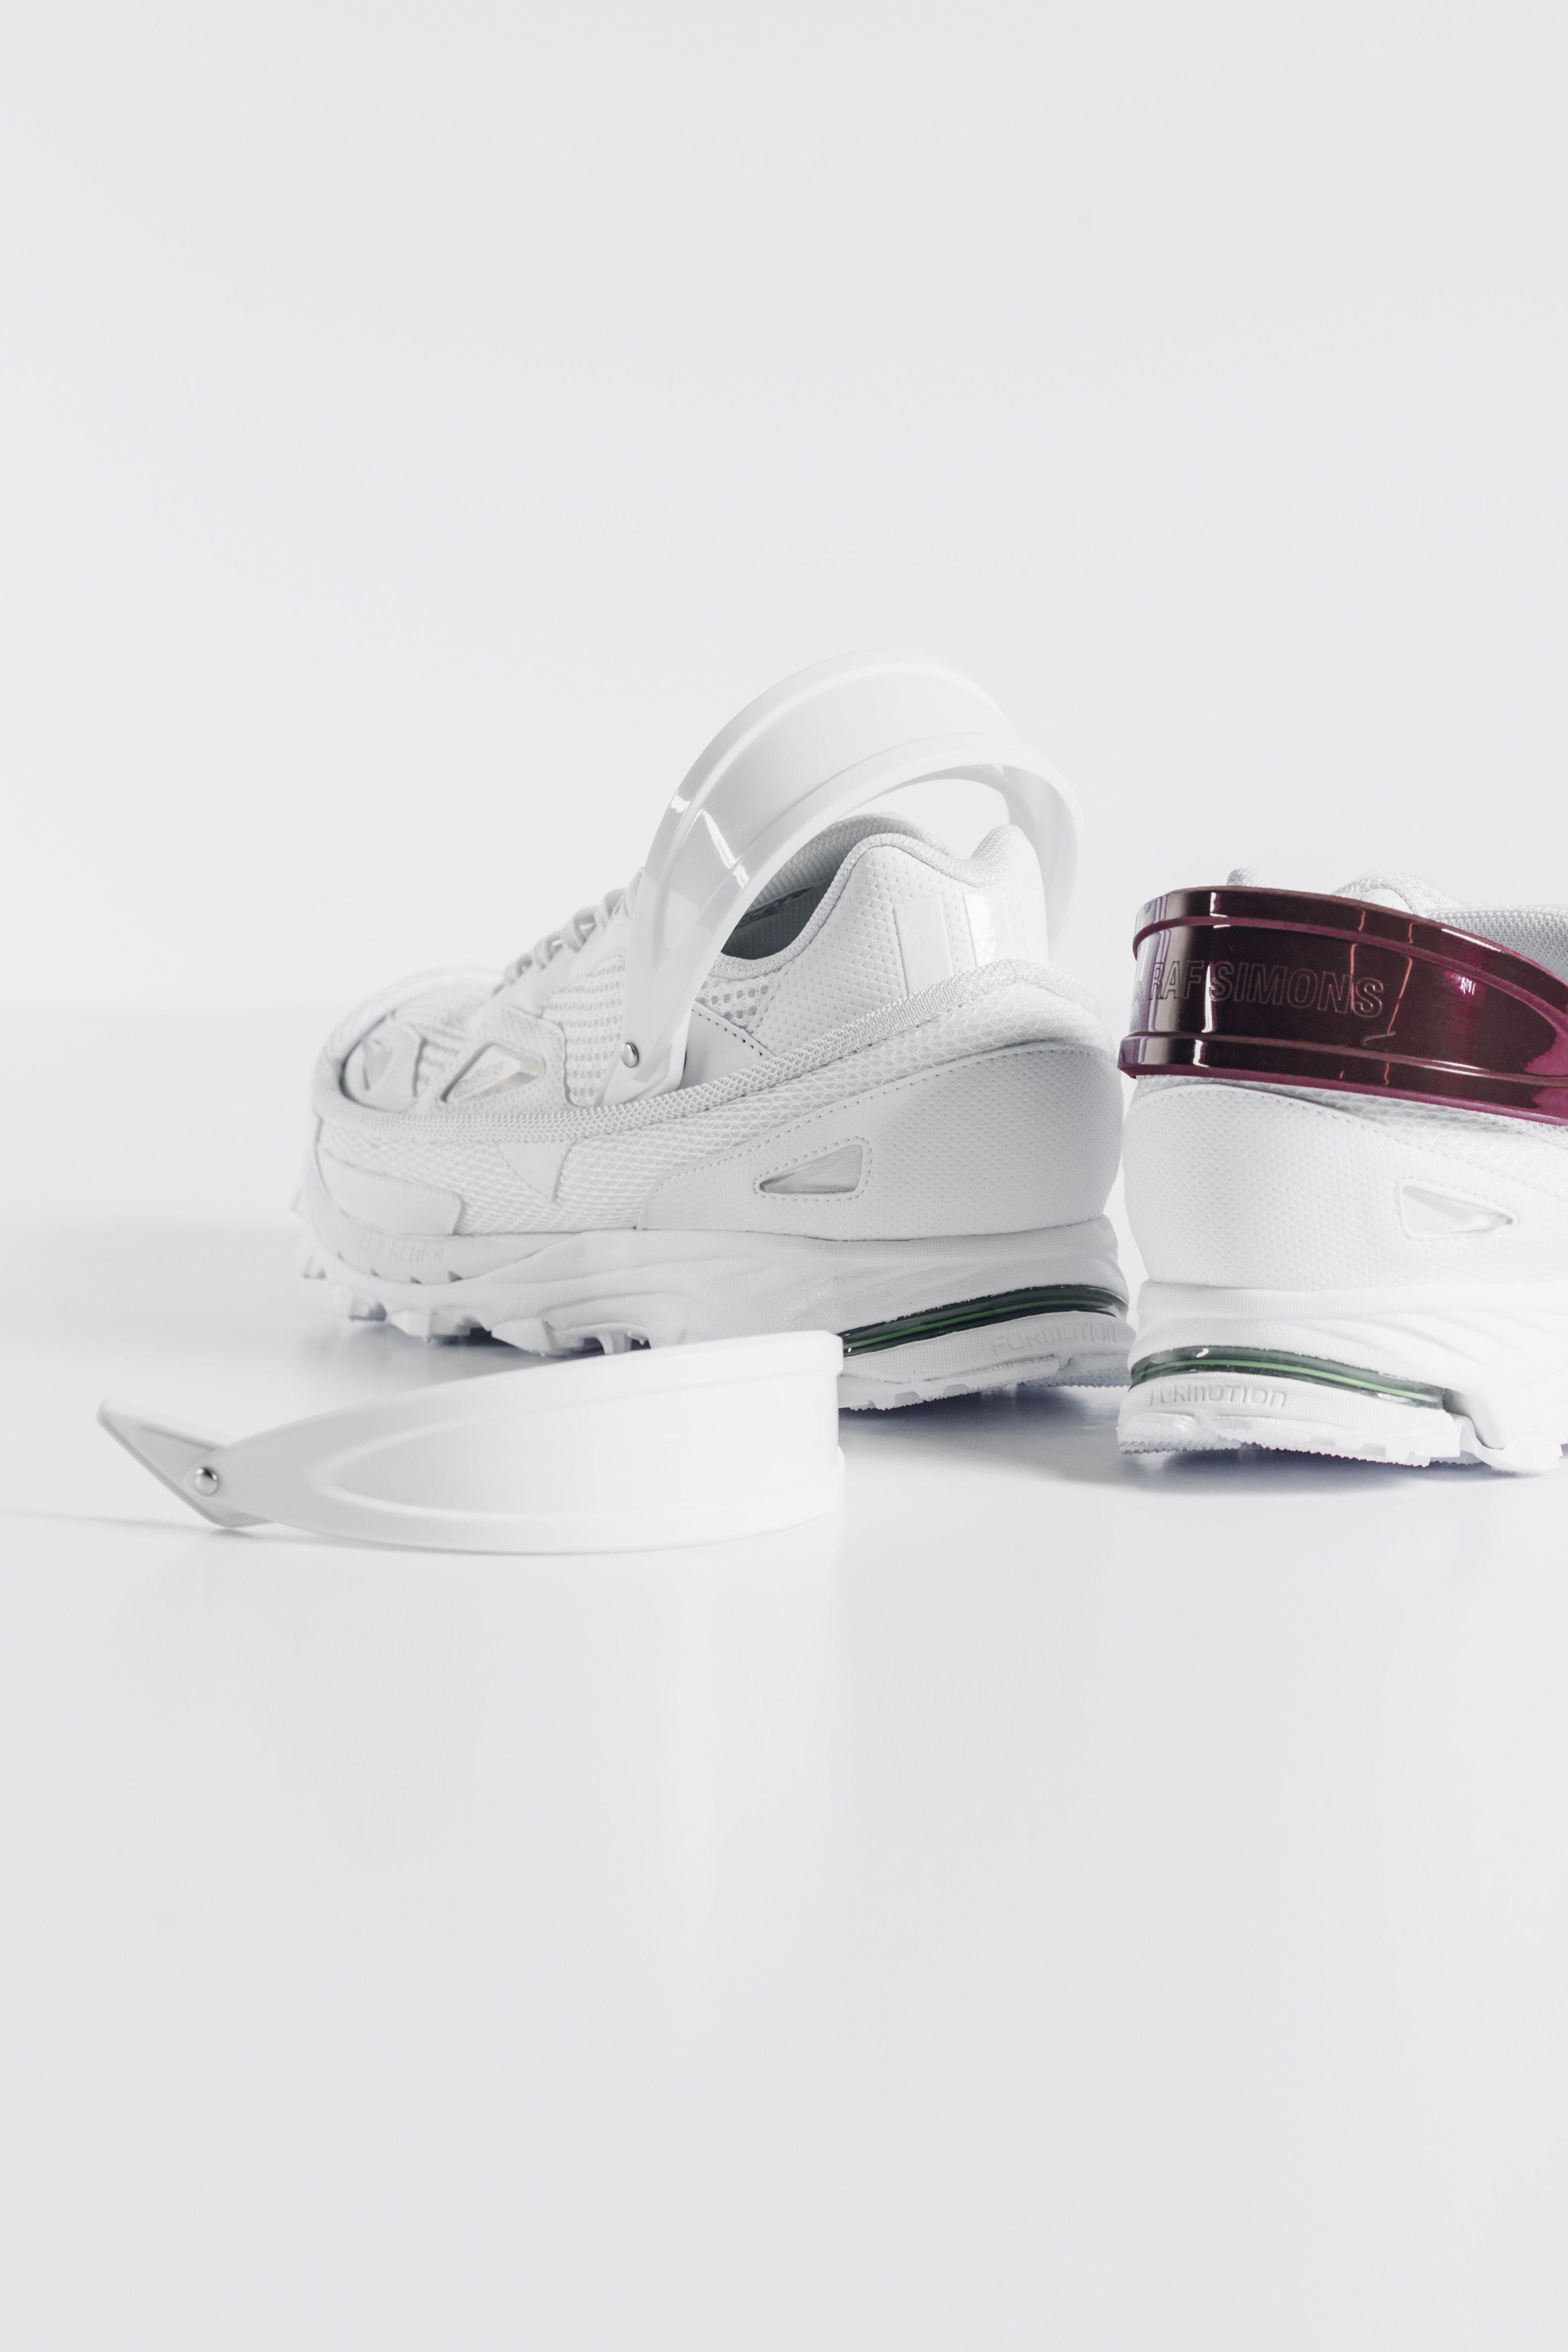 Adidas Originals x Raf Simons 'Response Trail'  #Adidas #RafSimons #ResponseTrail #Fashion #Streetwear #Style #Urban #Lookbook #Photography #Footwear #Sneakers #Kicks #Shoes